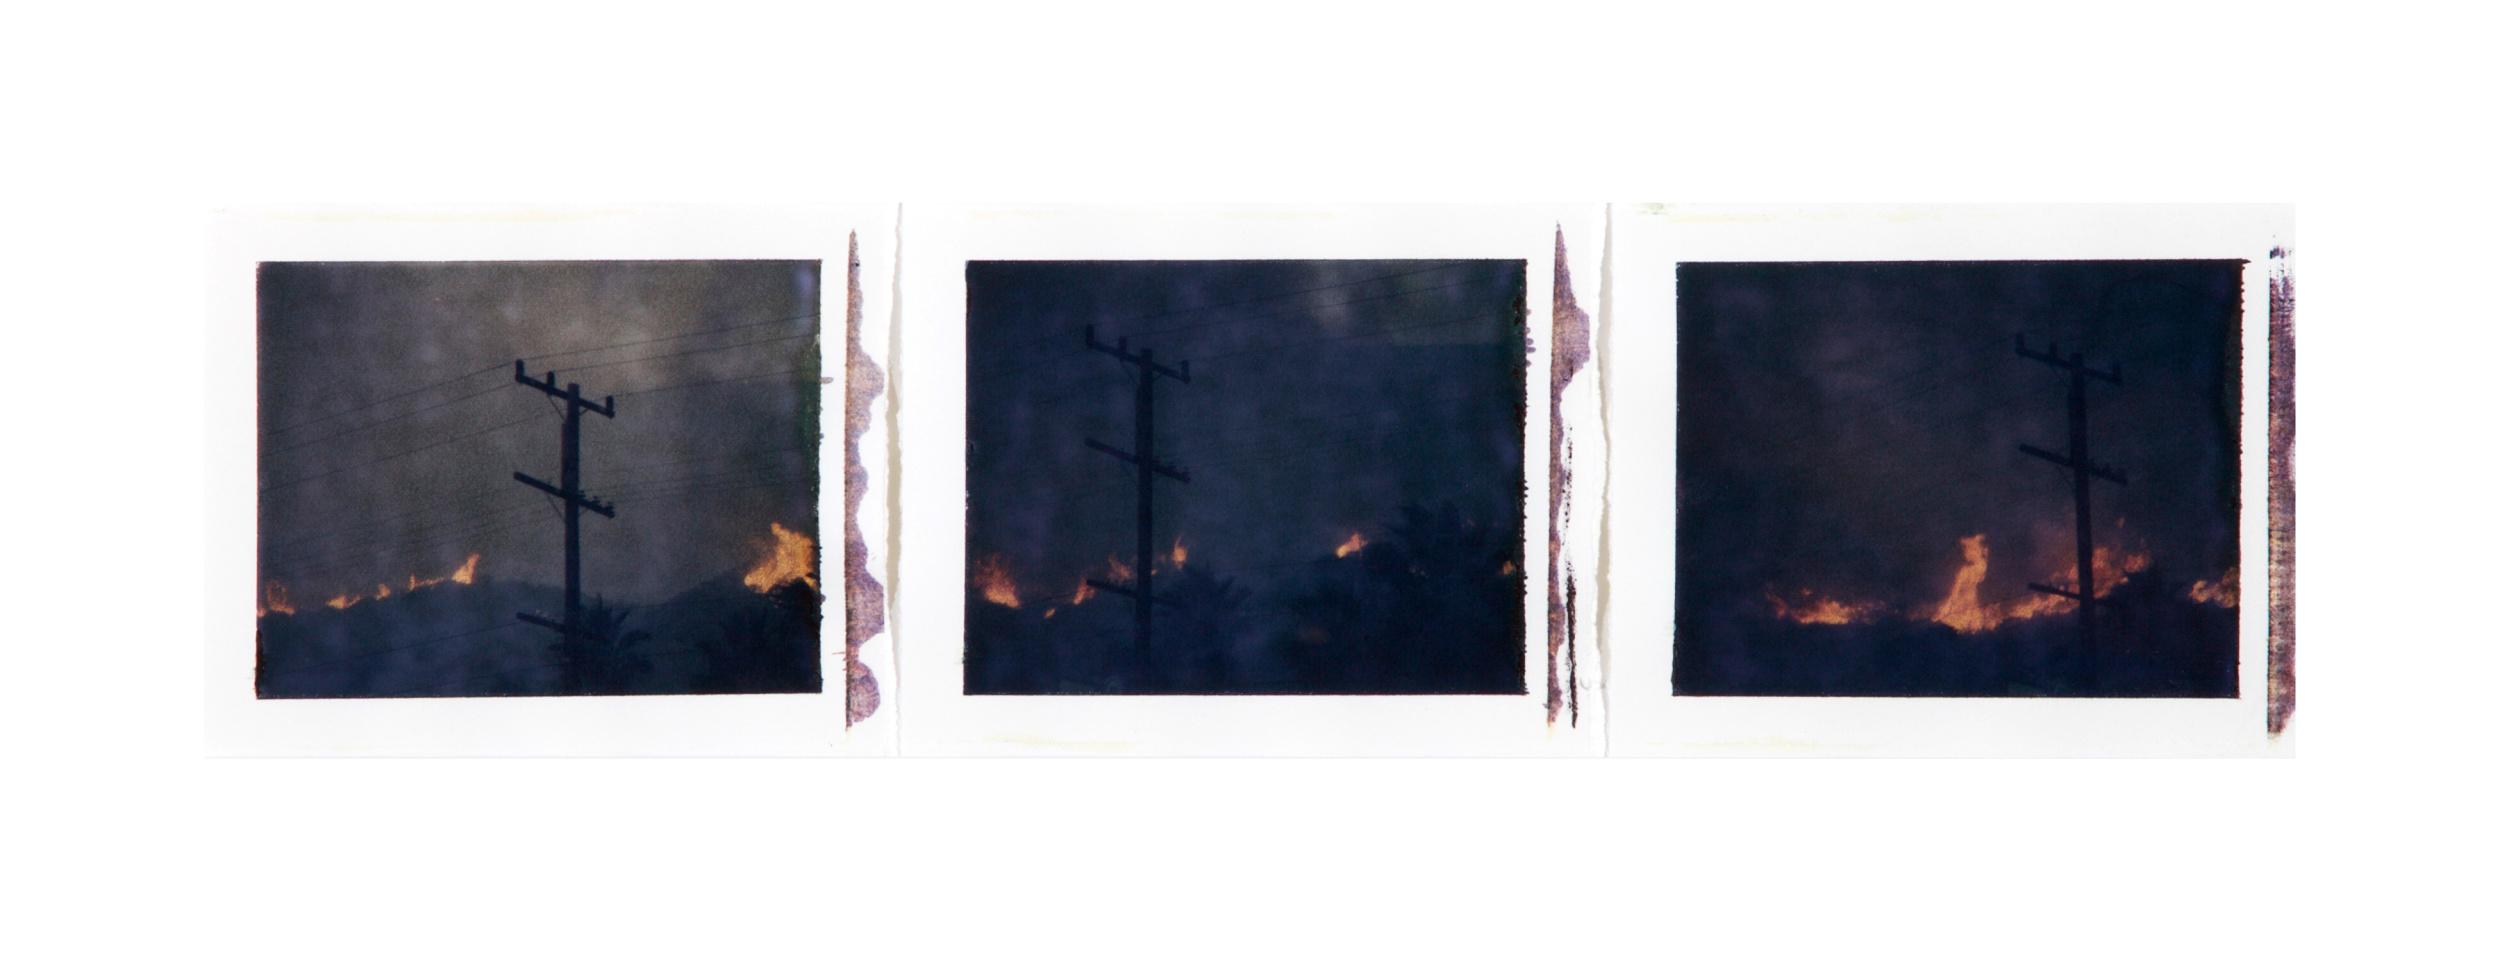 Brushfire #1, Malibu, 1996